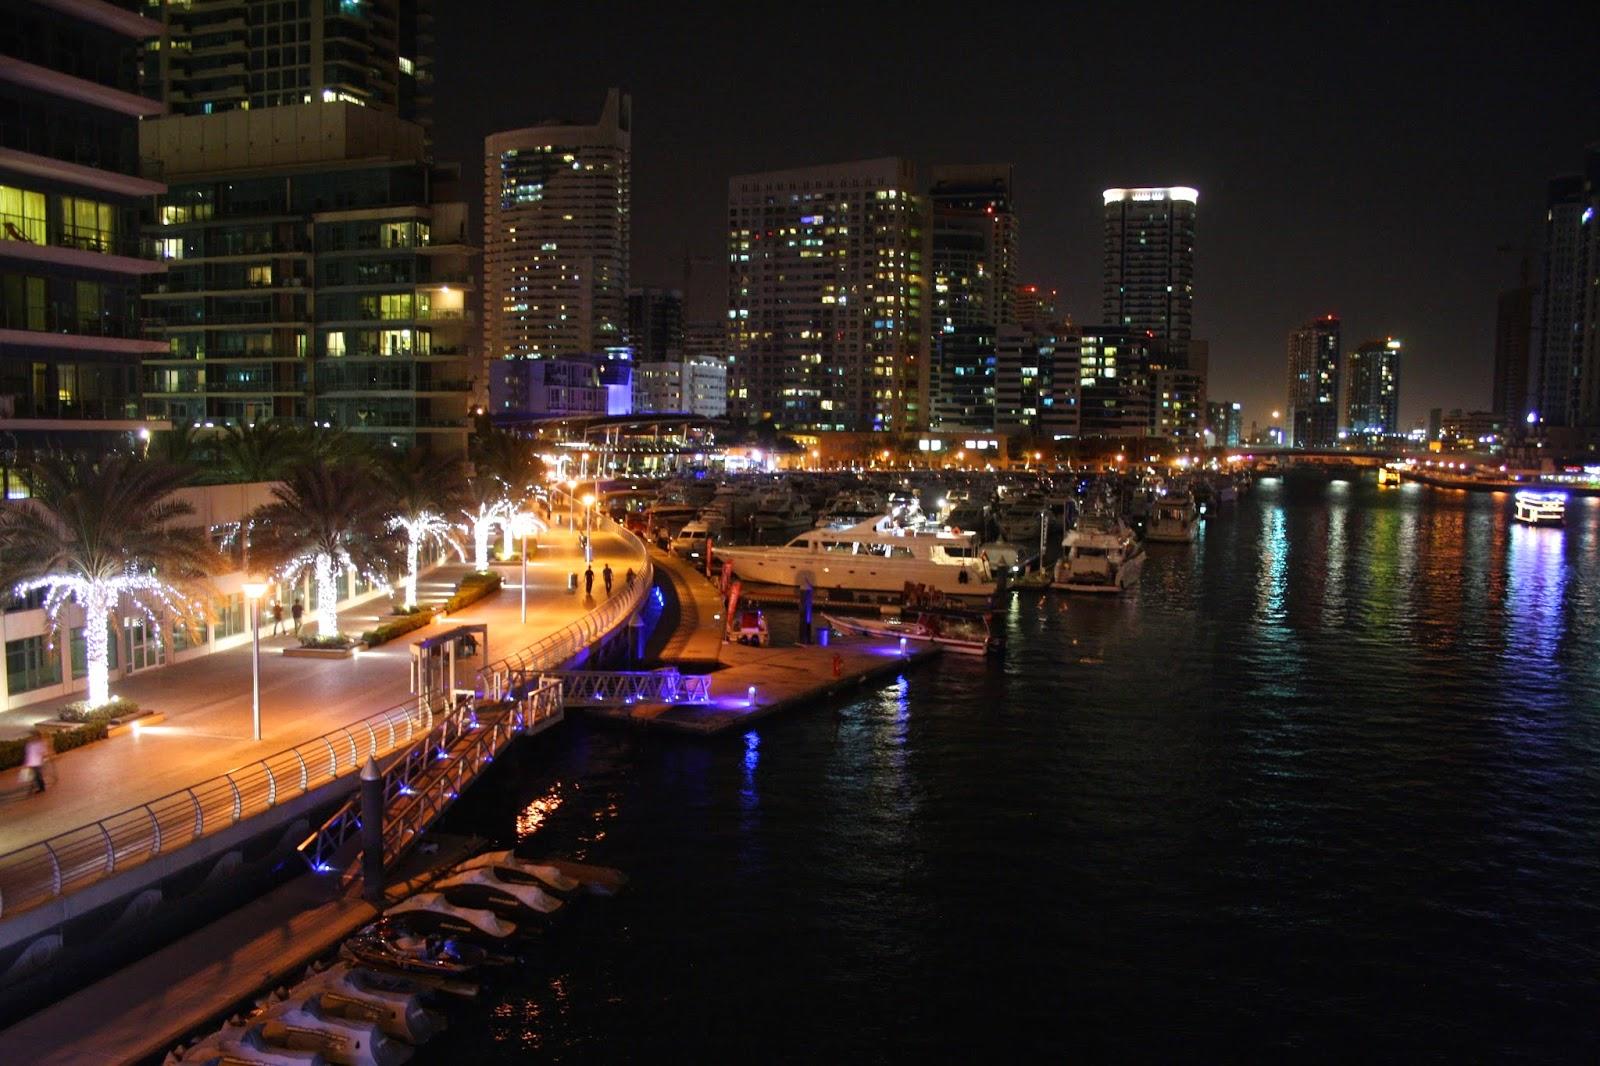 DUBAI PHOTO DIARY I. 10